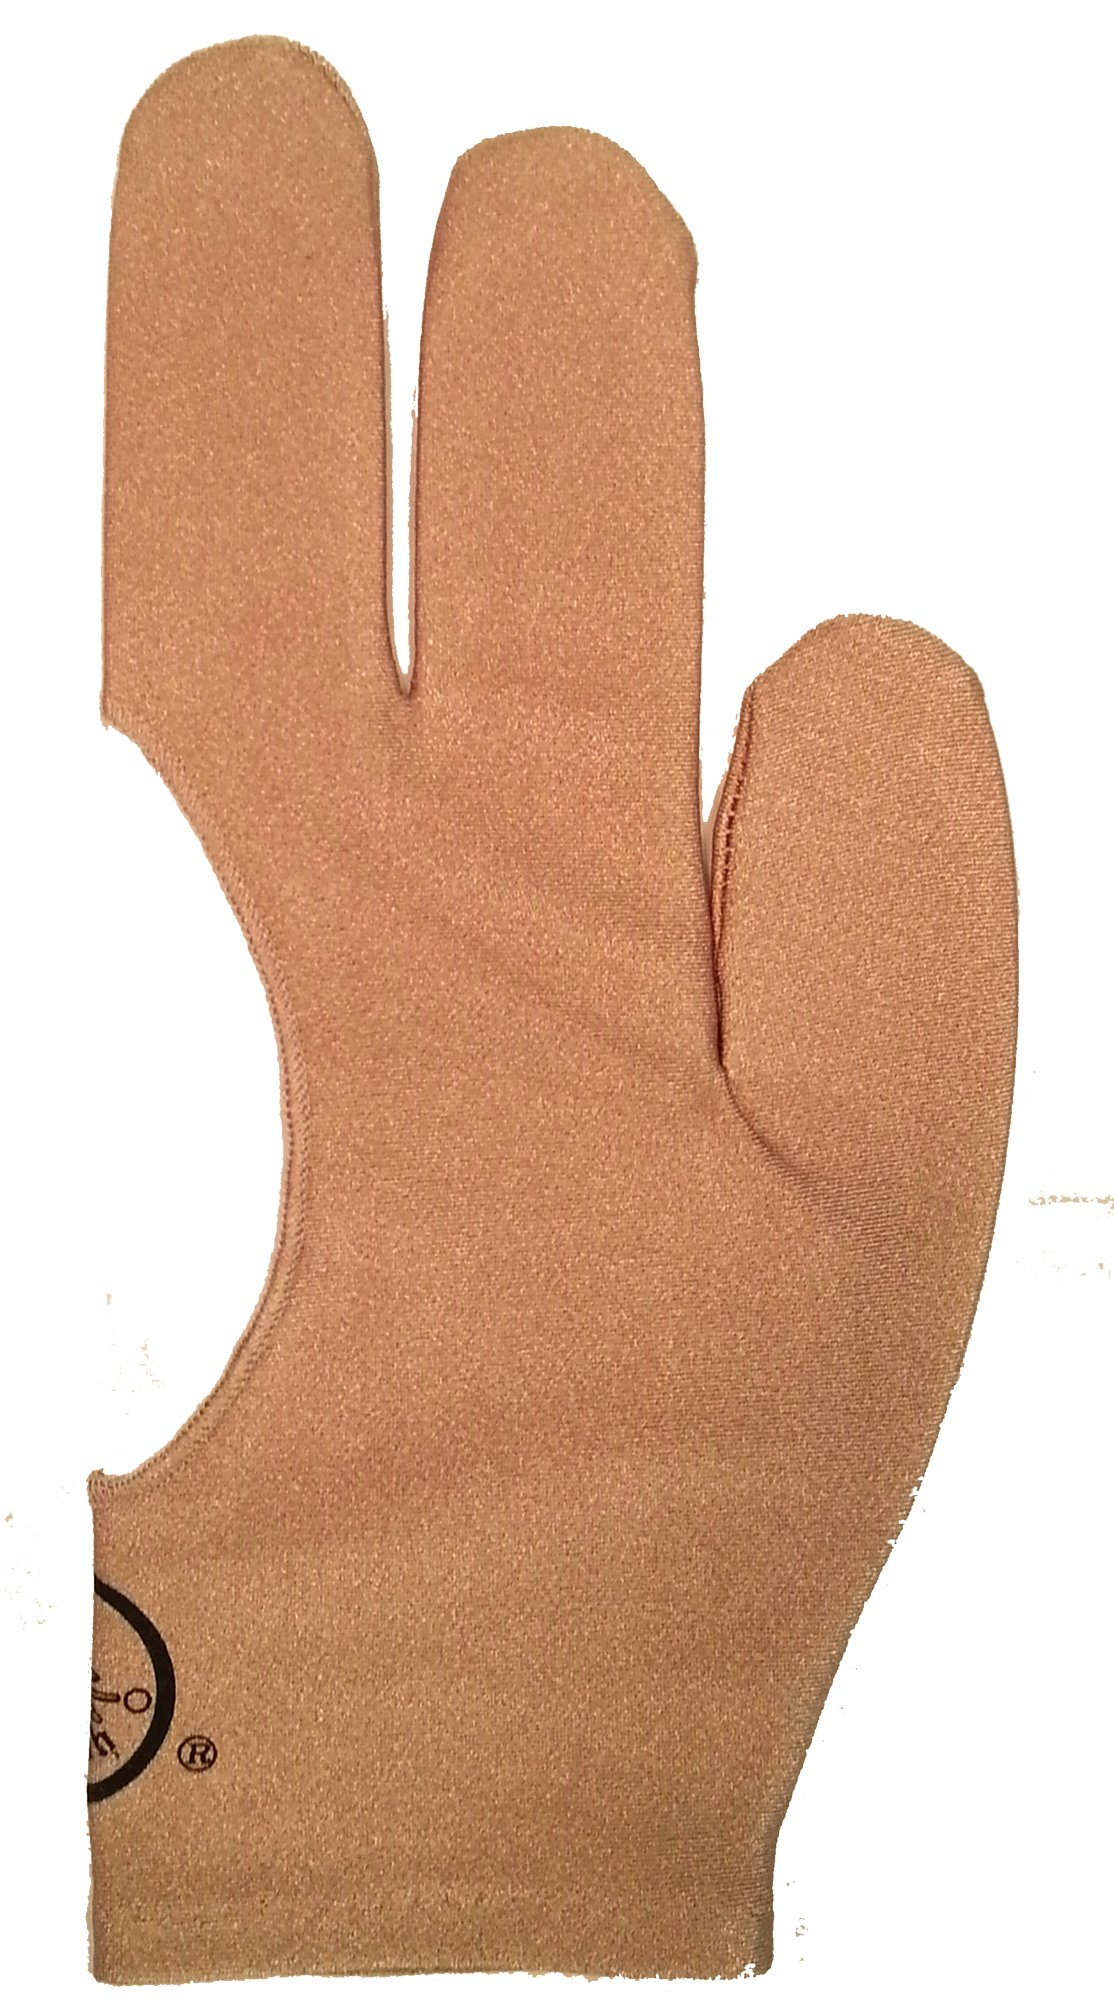 Sir Joseph Billiard Glove - Extra Small - Tan